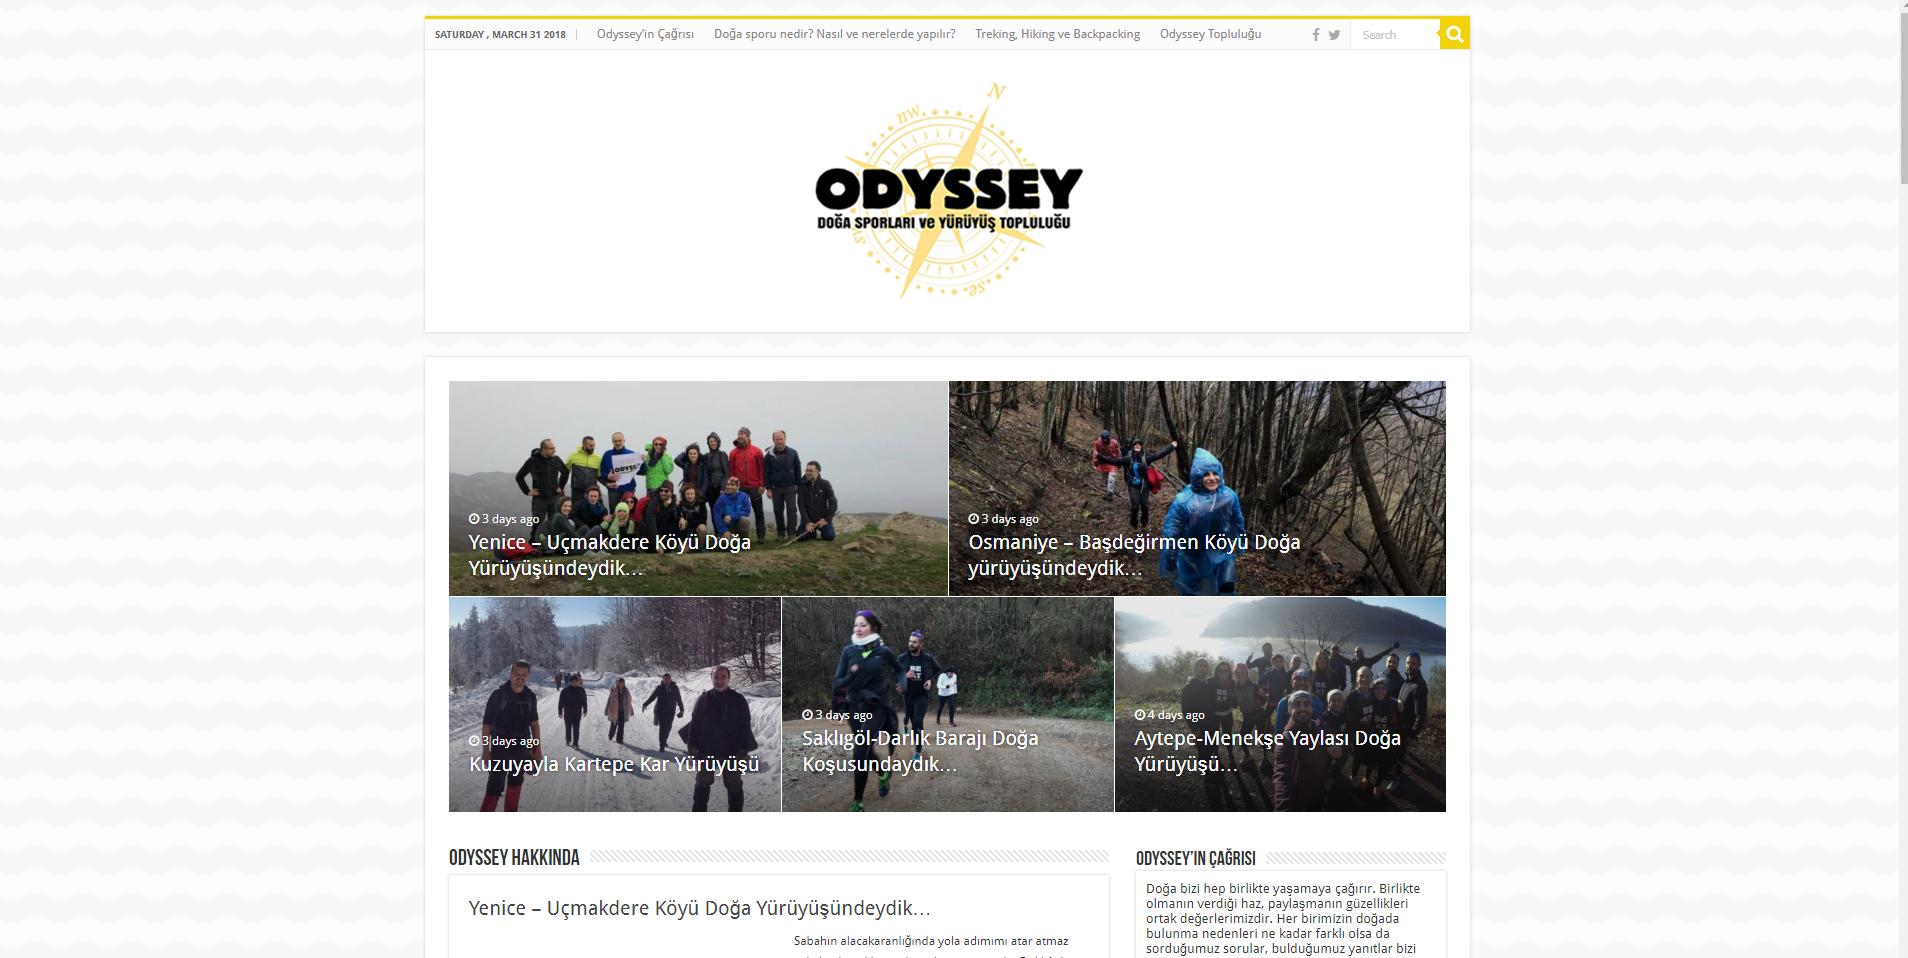 Odyssey Doğa Sporları